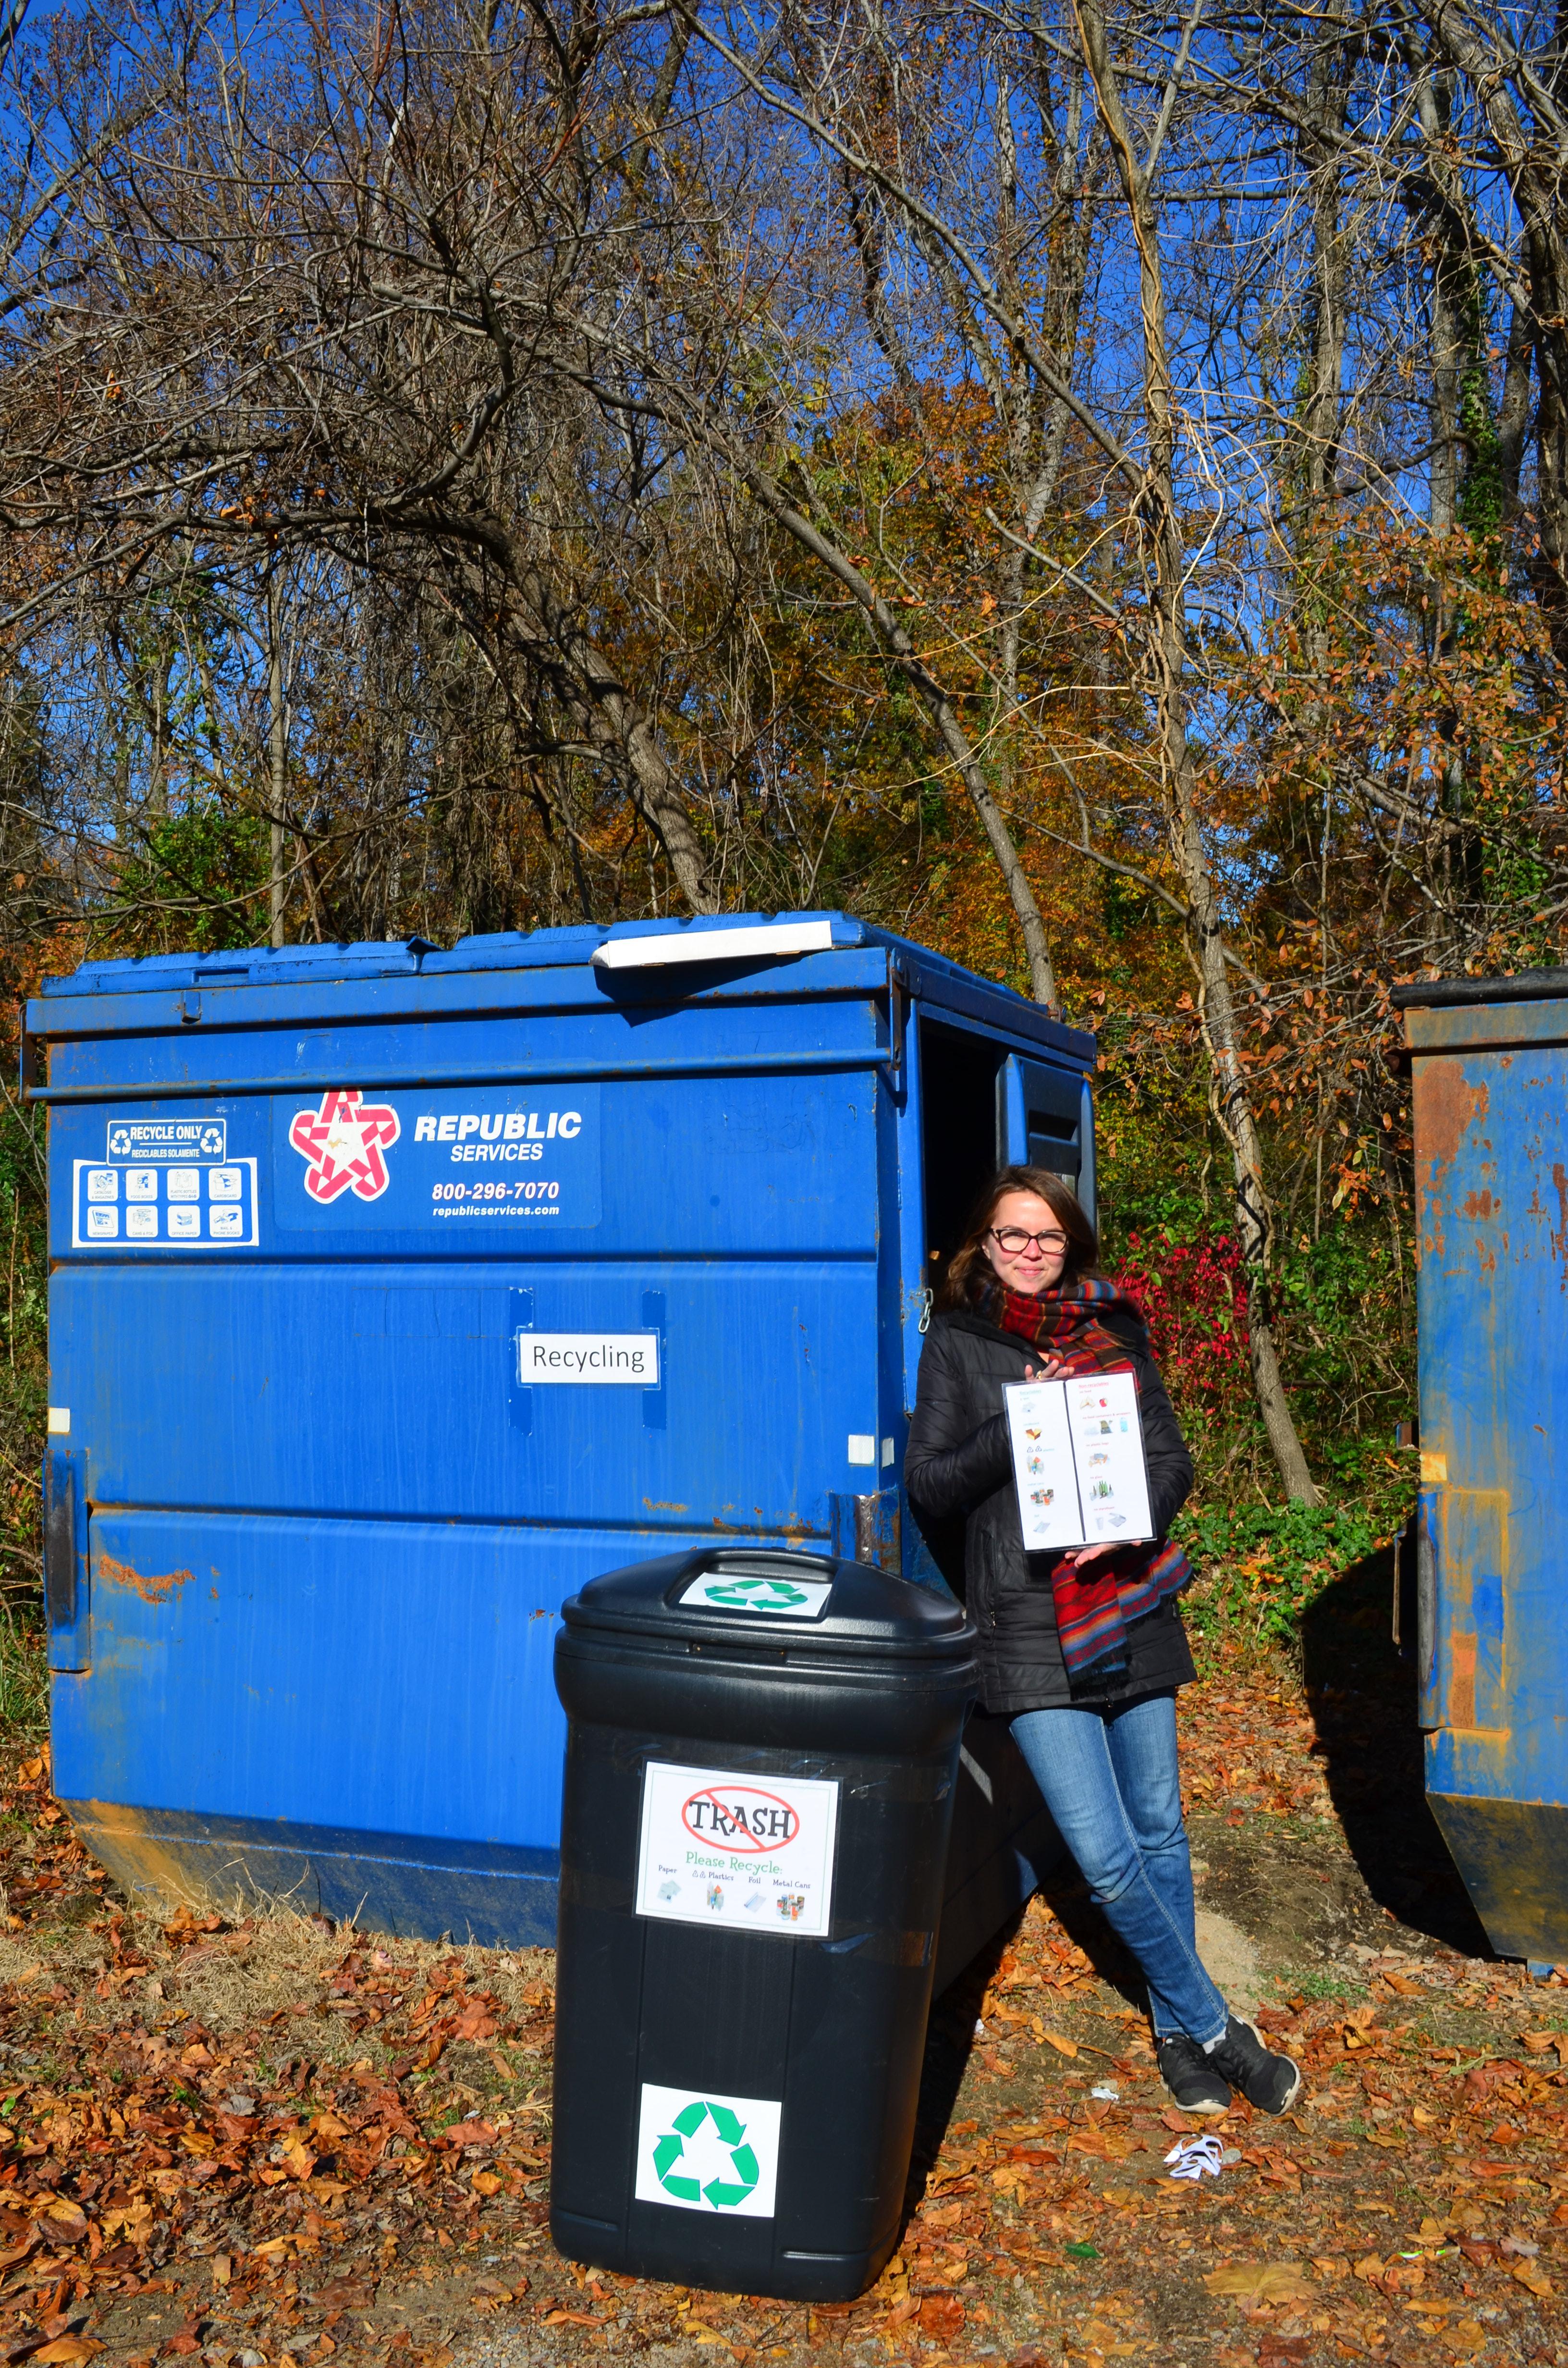 nicki and recycling bin